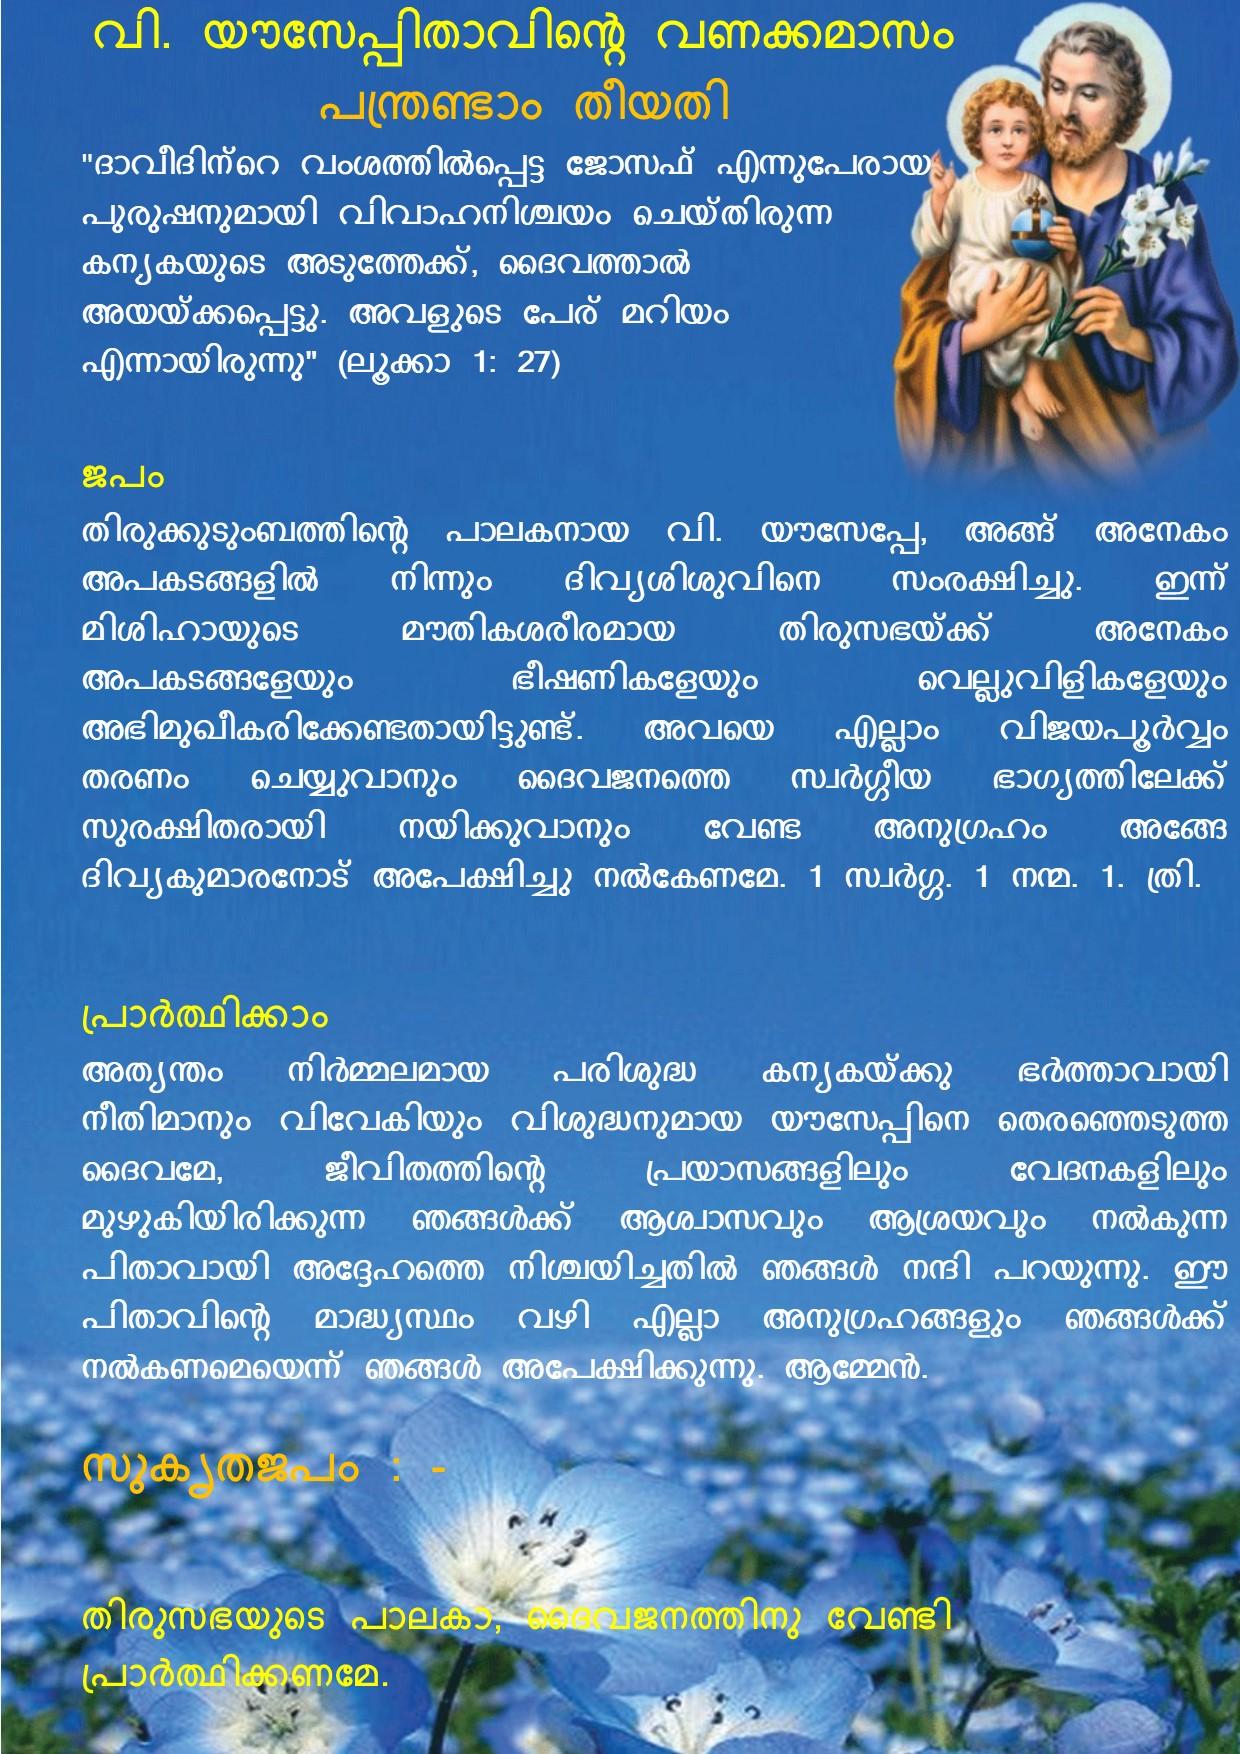 Vanakkamasam, St Joseph, March 12